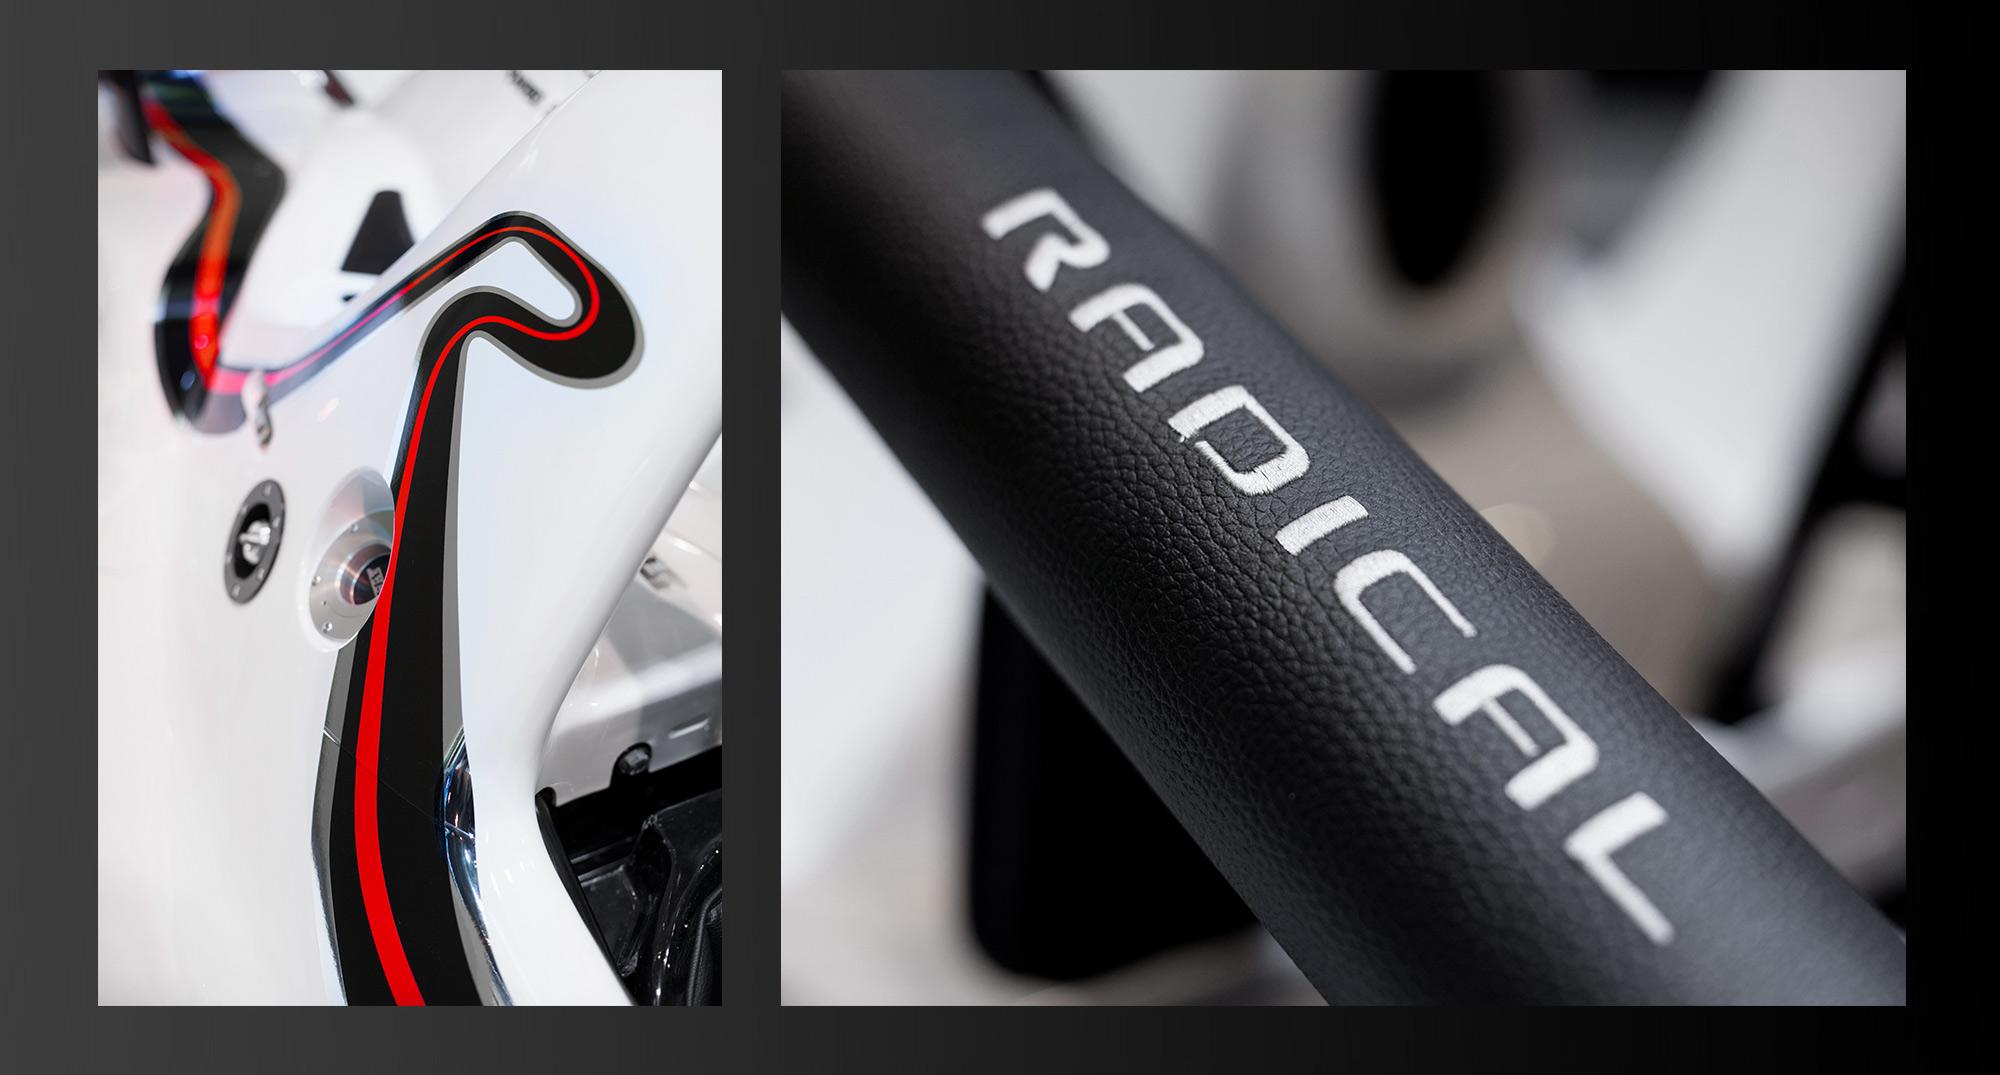 The-Allotment-Radical-Car-Details-V2